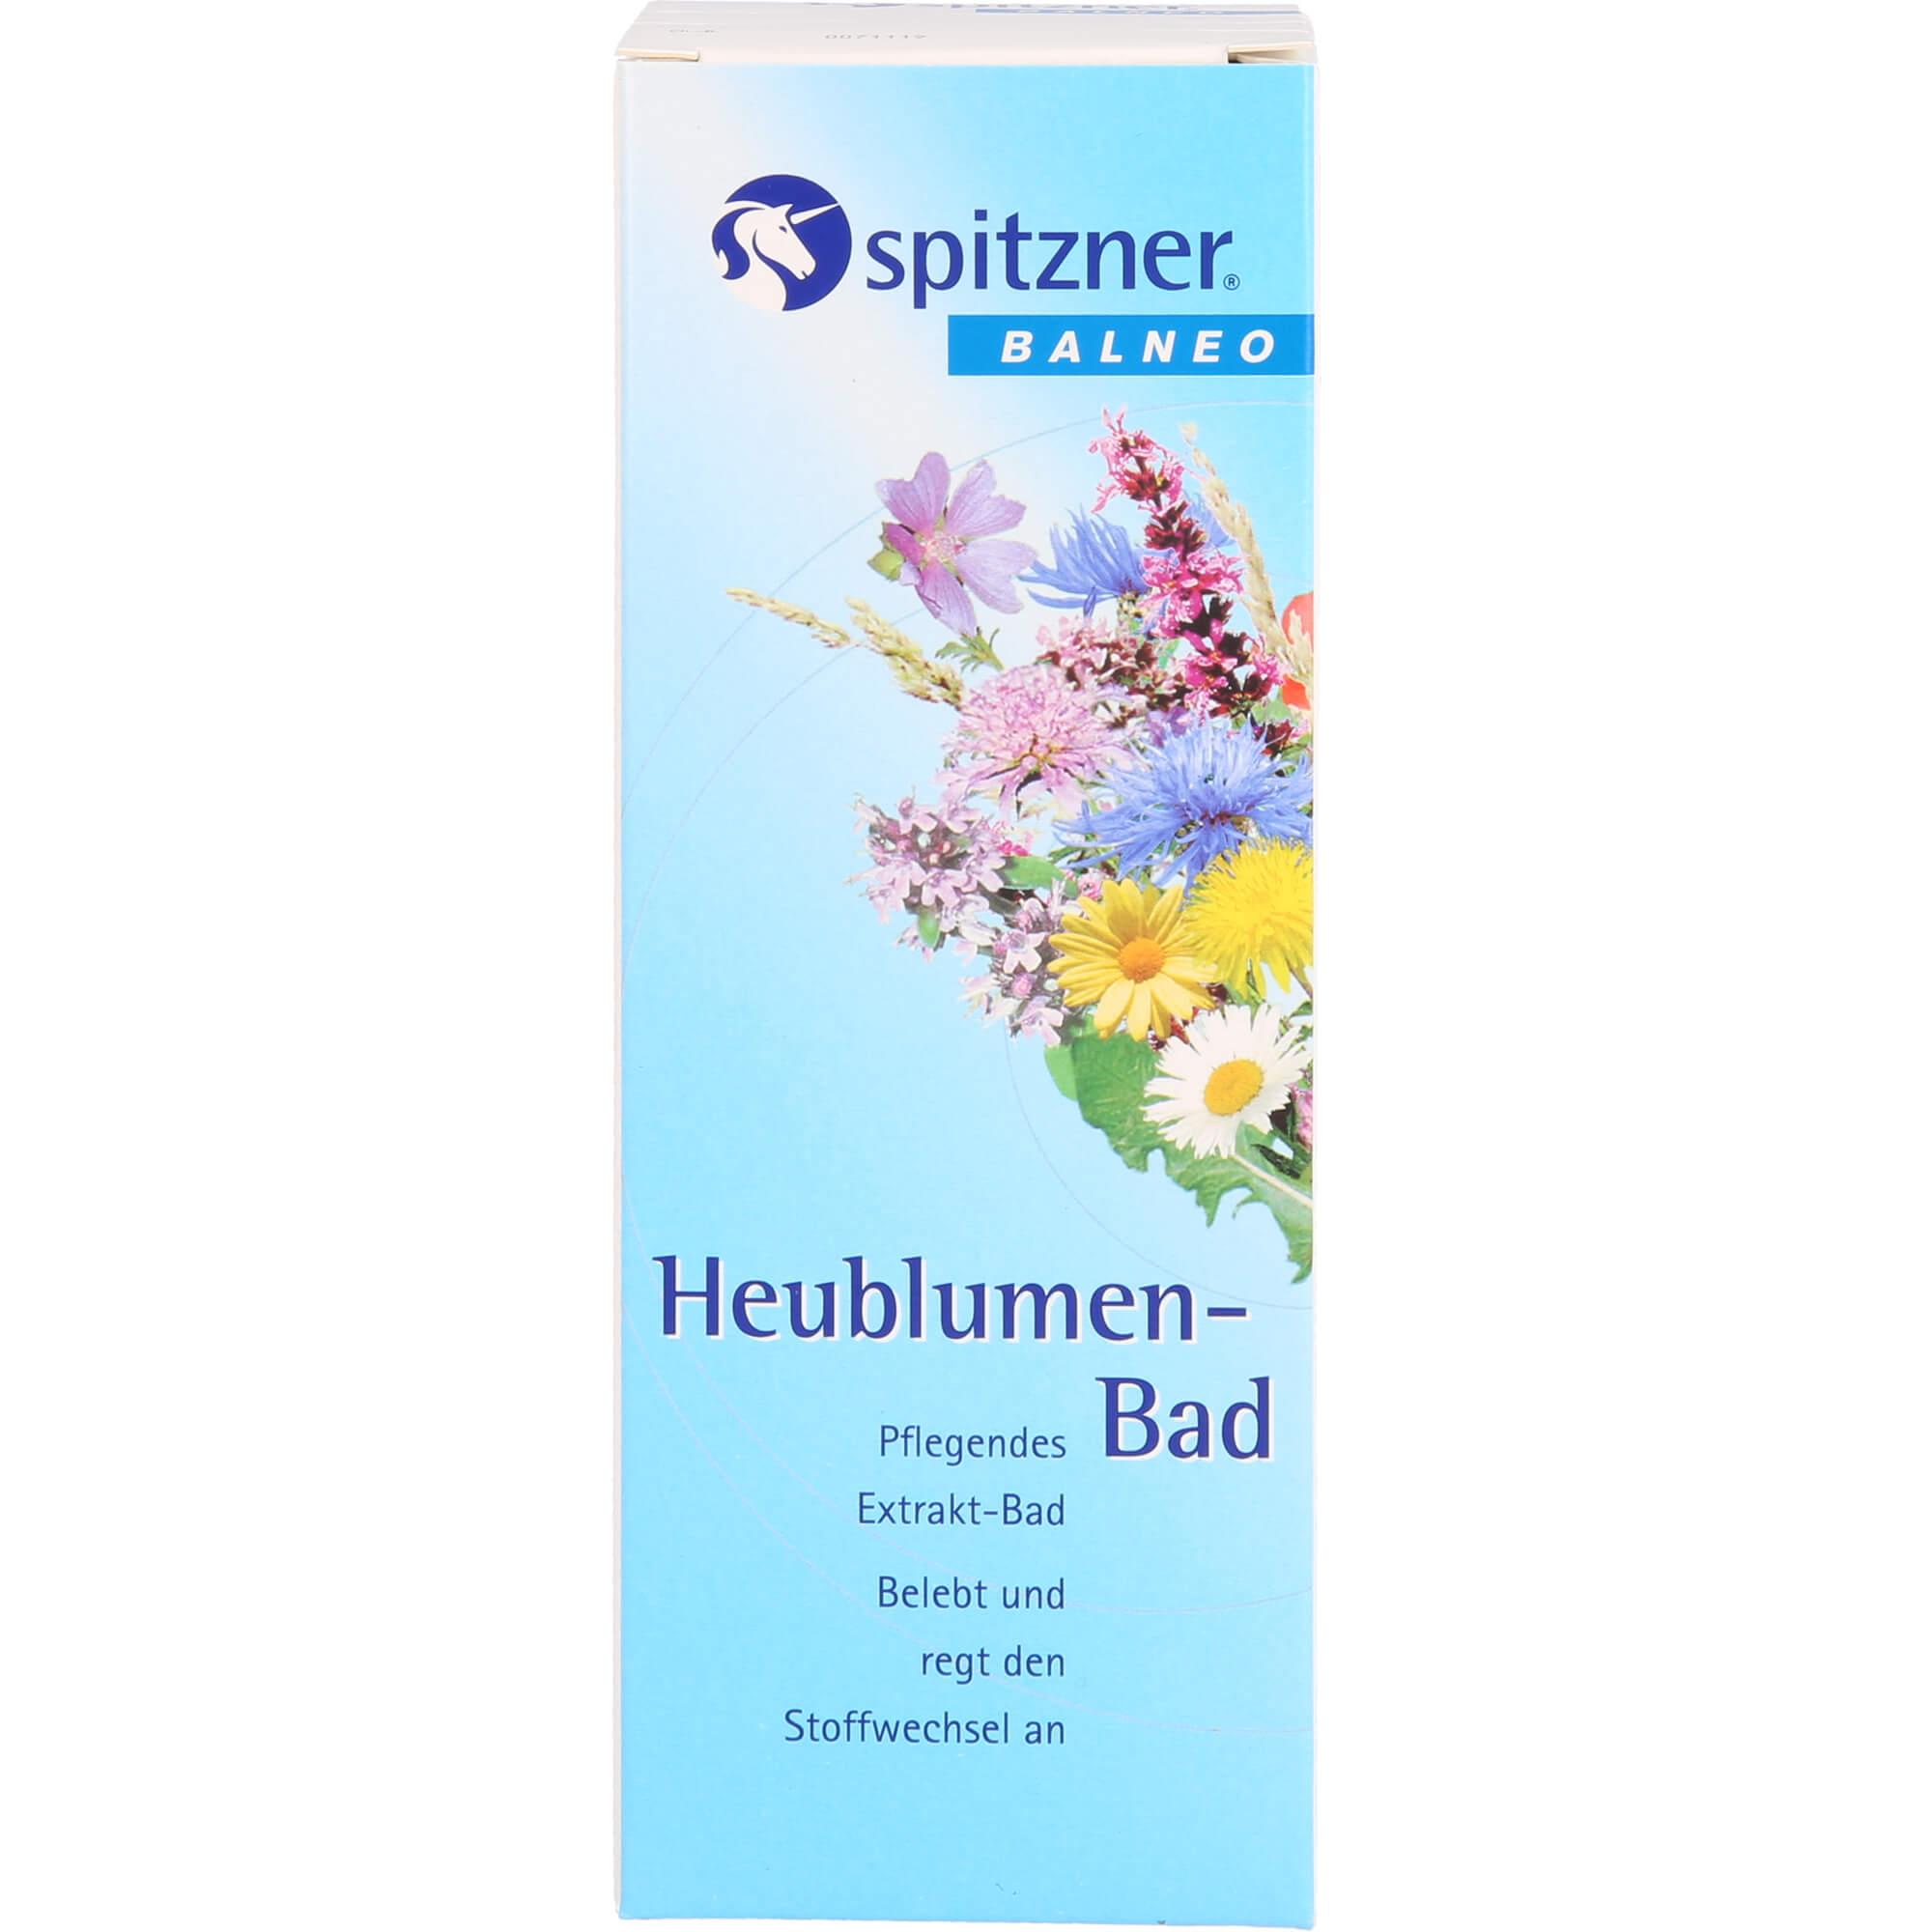 SPITZNER-Balneo-Heublumen-Bad